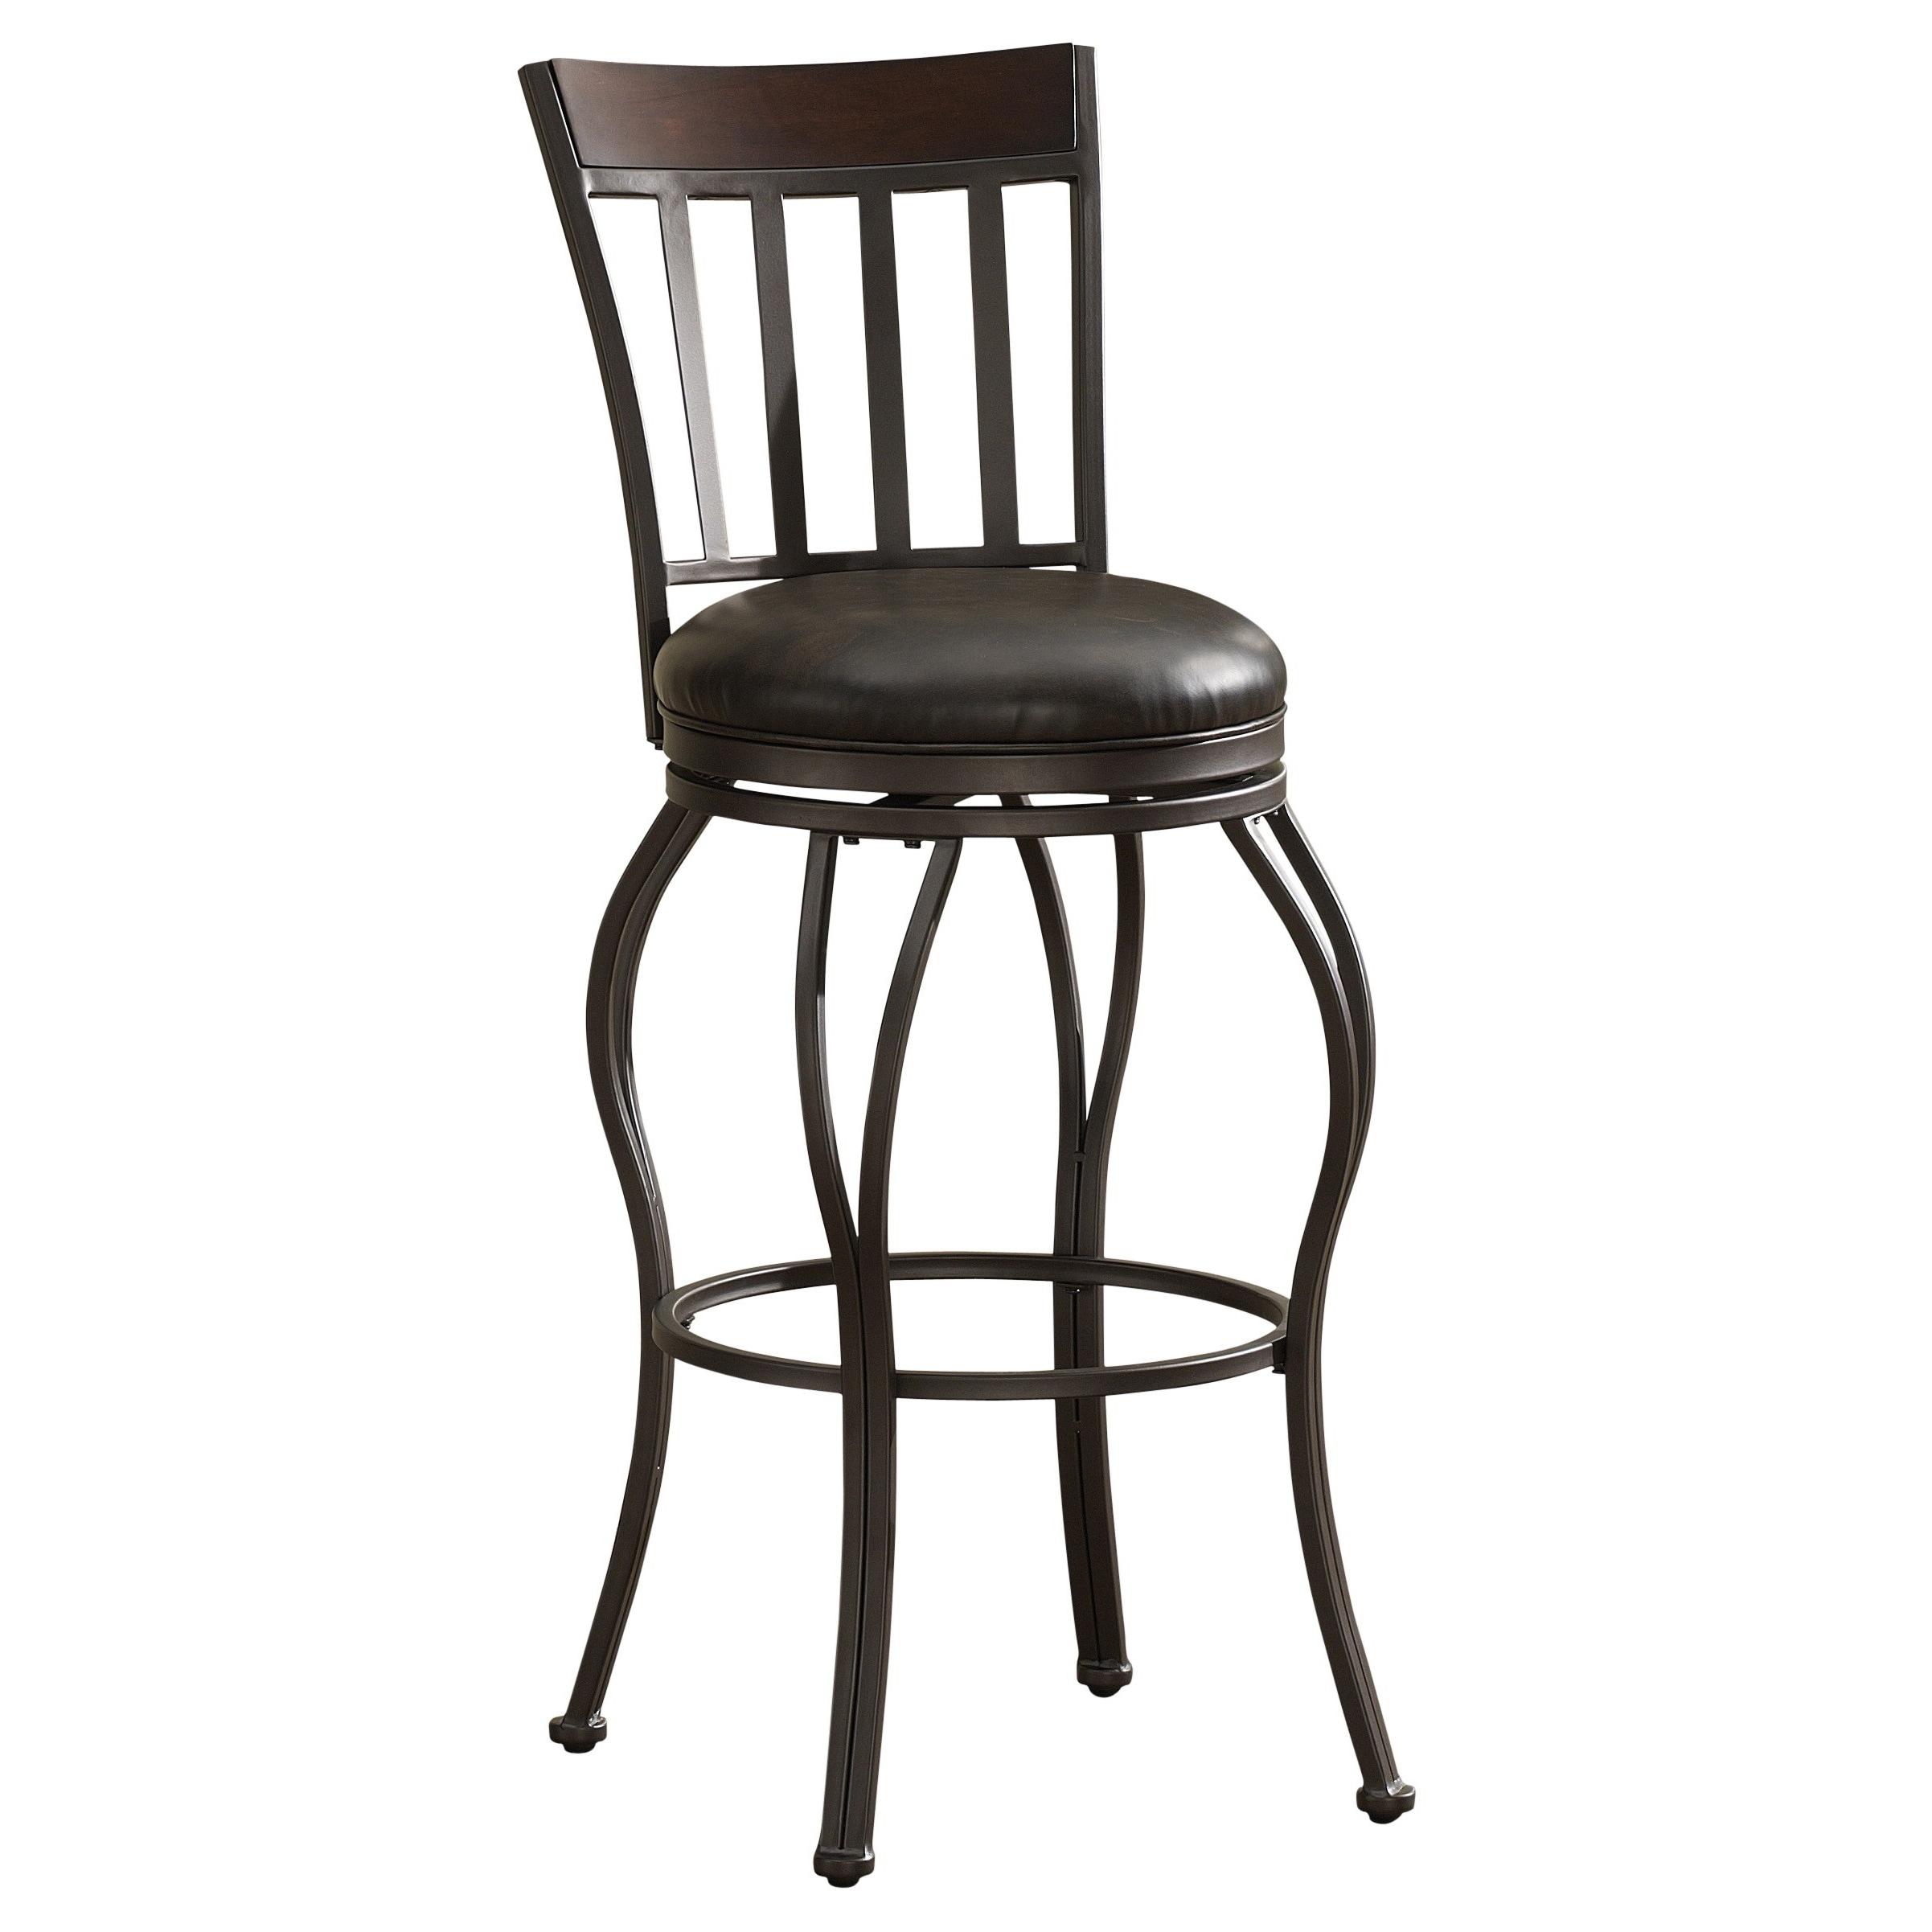 Enjoyable Lara 26 Inch Swivel Stool With Leather Seat Machost Co Dining Chair Design Ideas Machostcouk